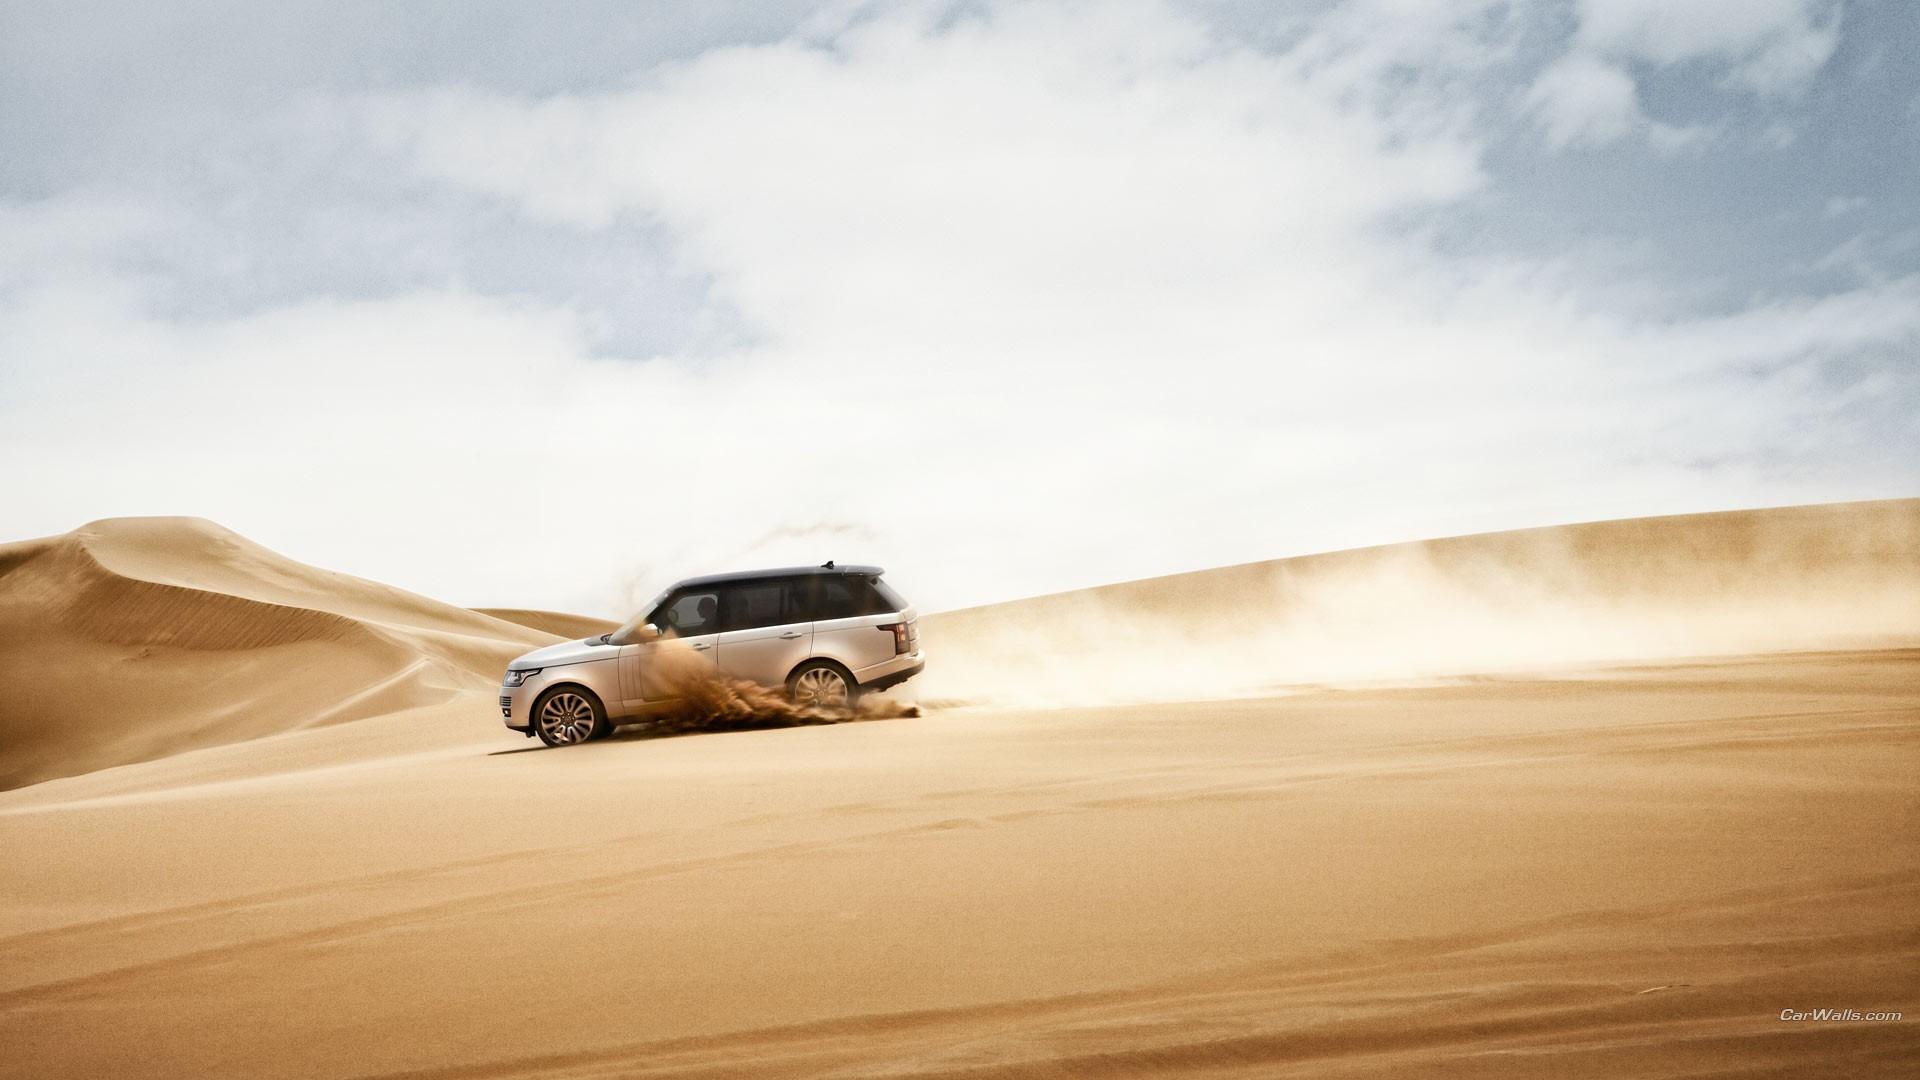 General 1920x1080 Range Rover car desert vehicle